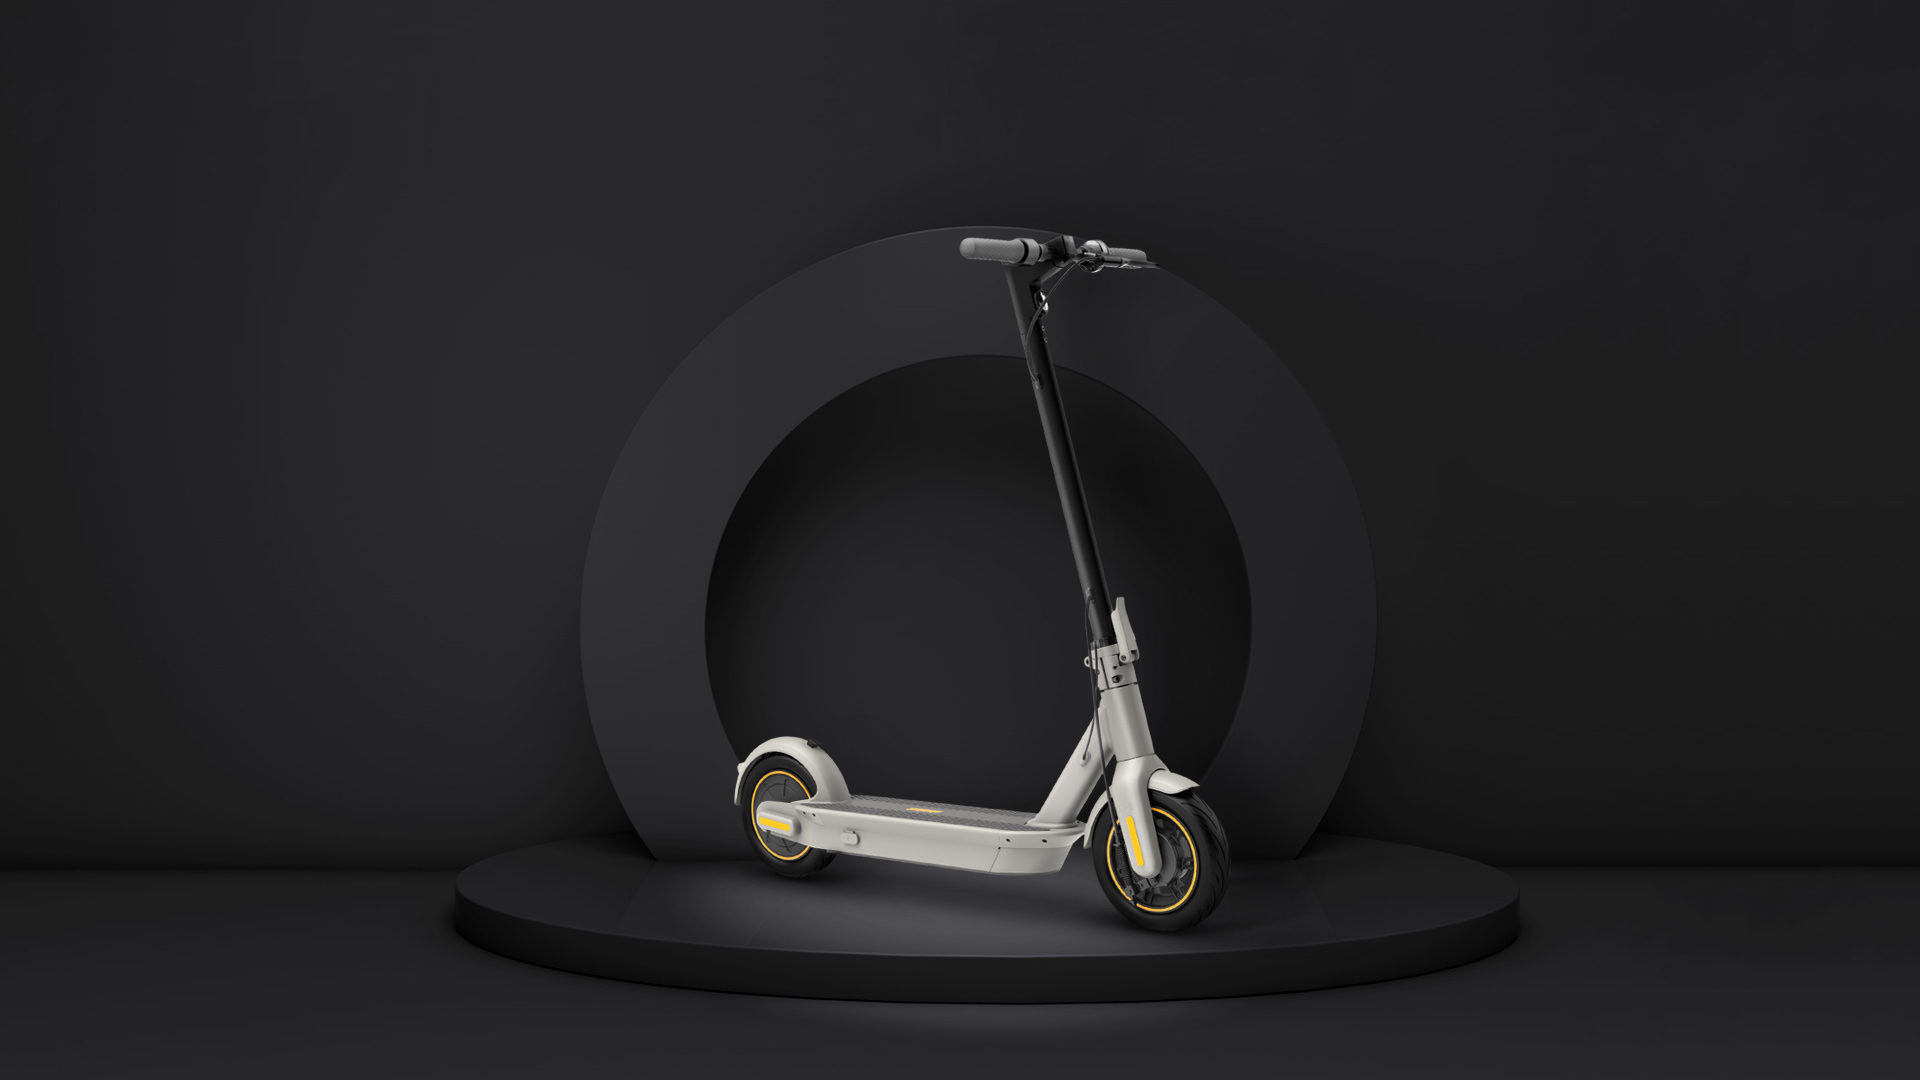 [hero] Ninebot KickScooter MAX G30LE Powered by Segway